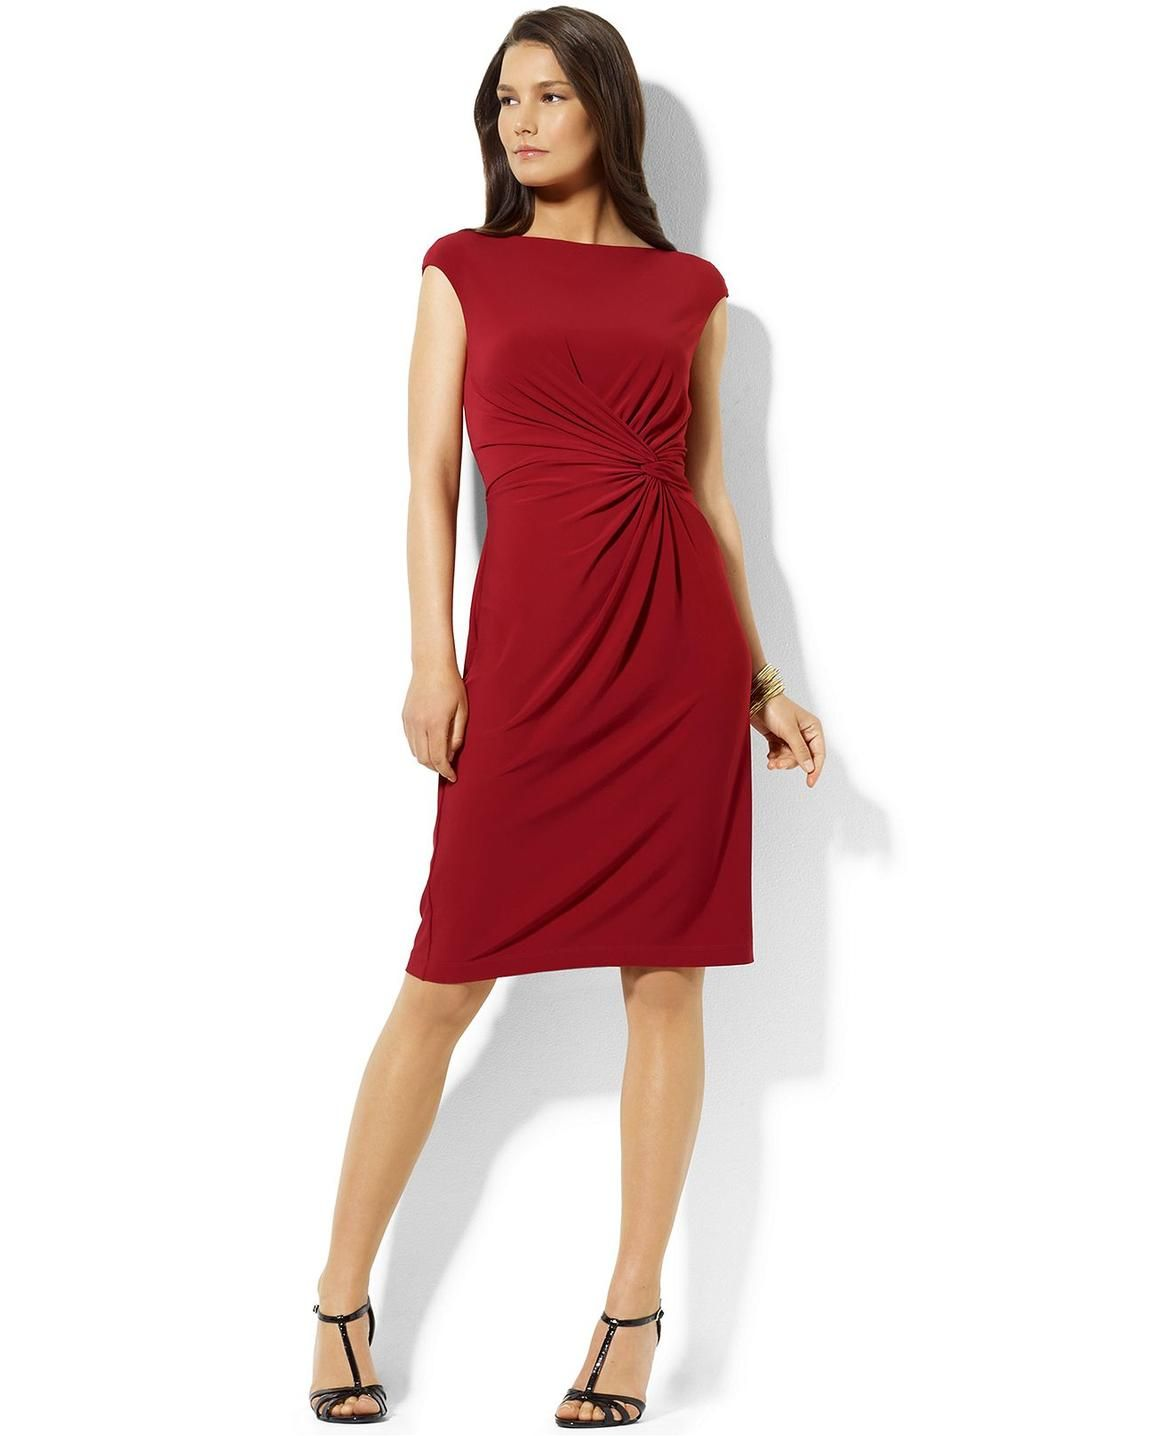 Petite red sheath dress — 4